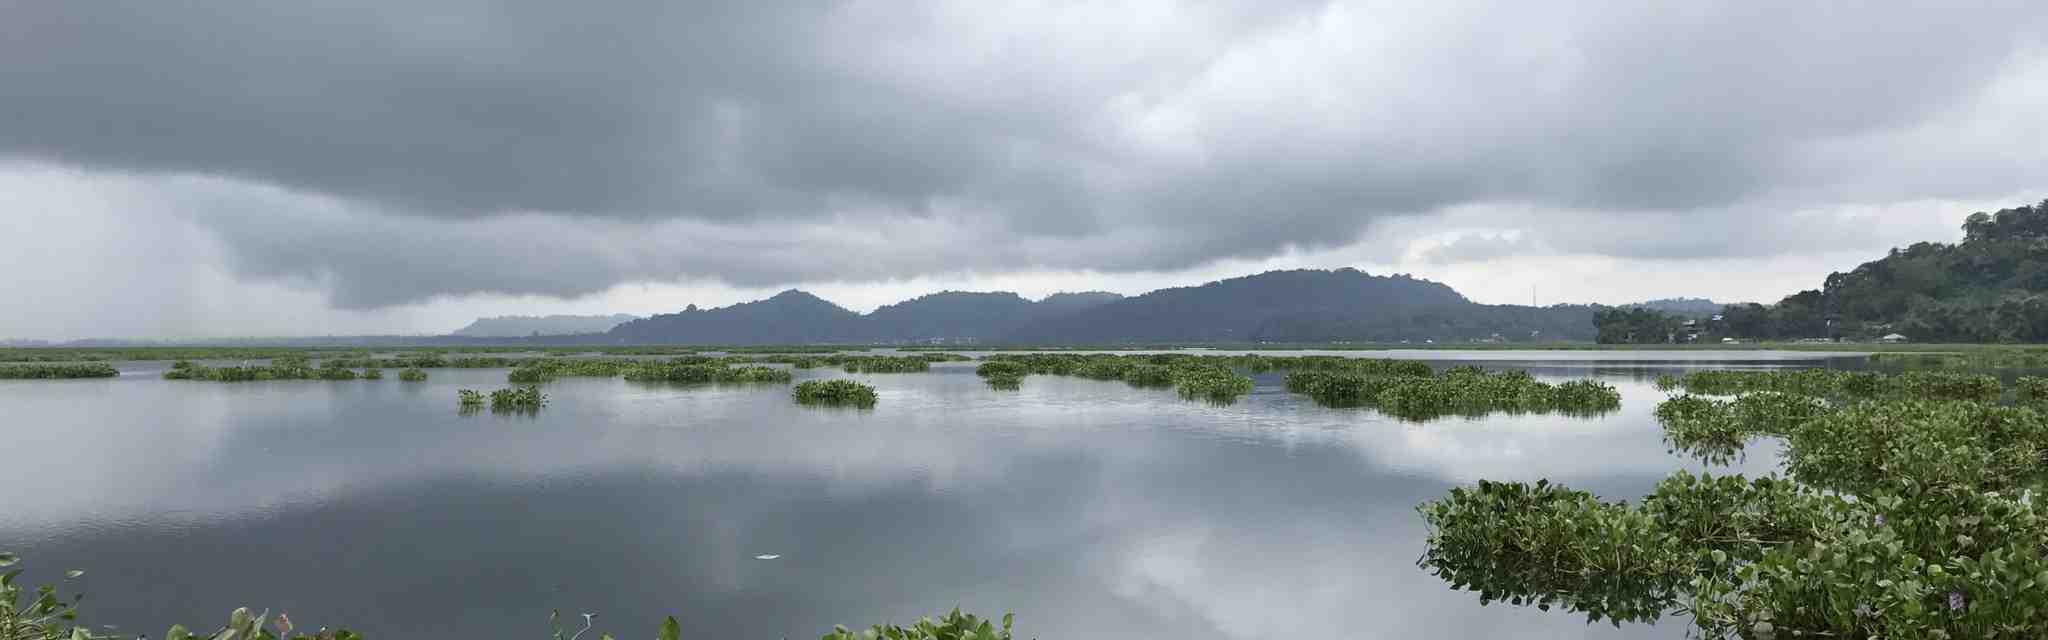 8 Panduan Wisata Tondano, Surga Tersembunyi di Sulawesi Utara